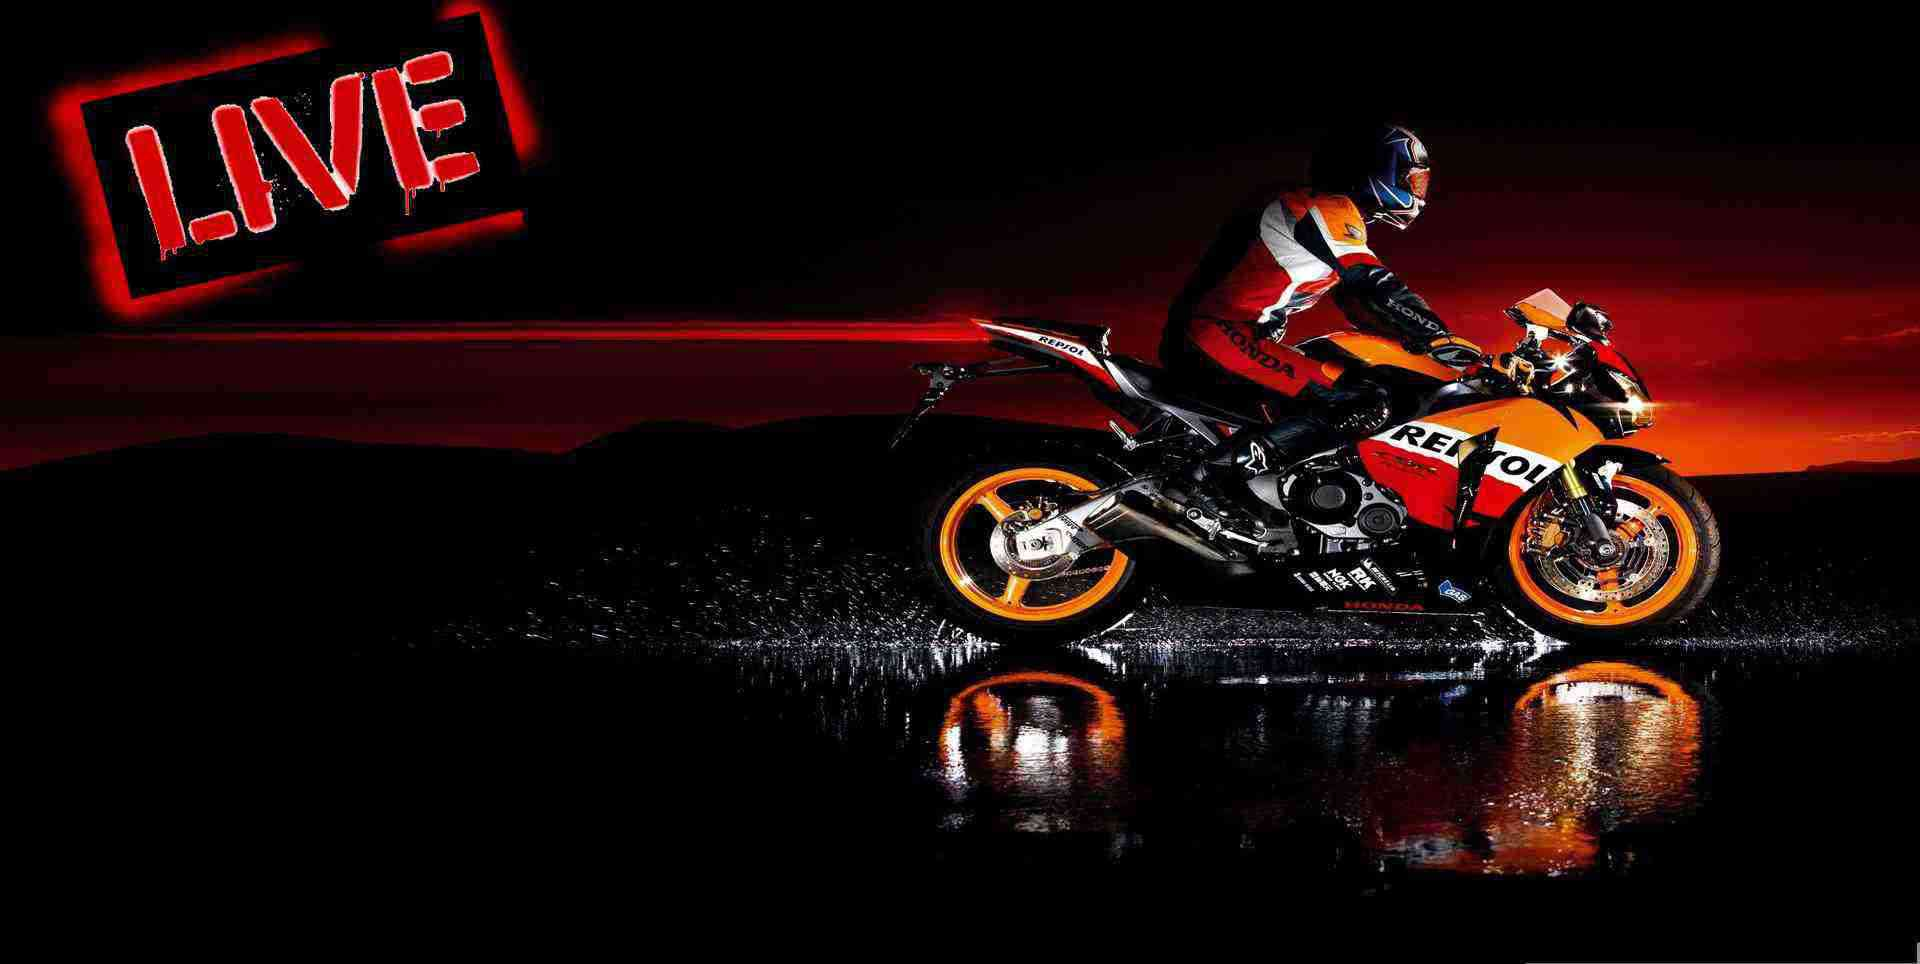 live-online-motogp-grand-prix-of-san-marino